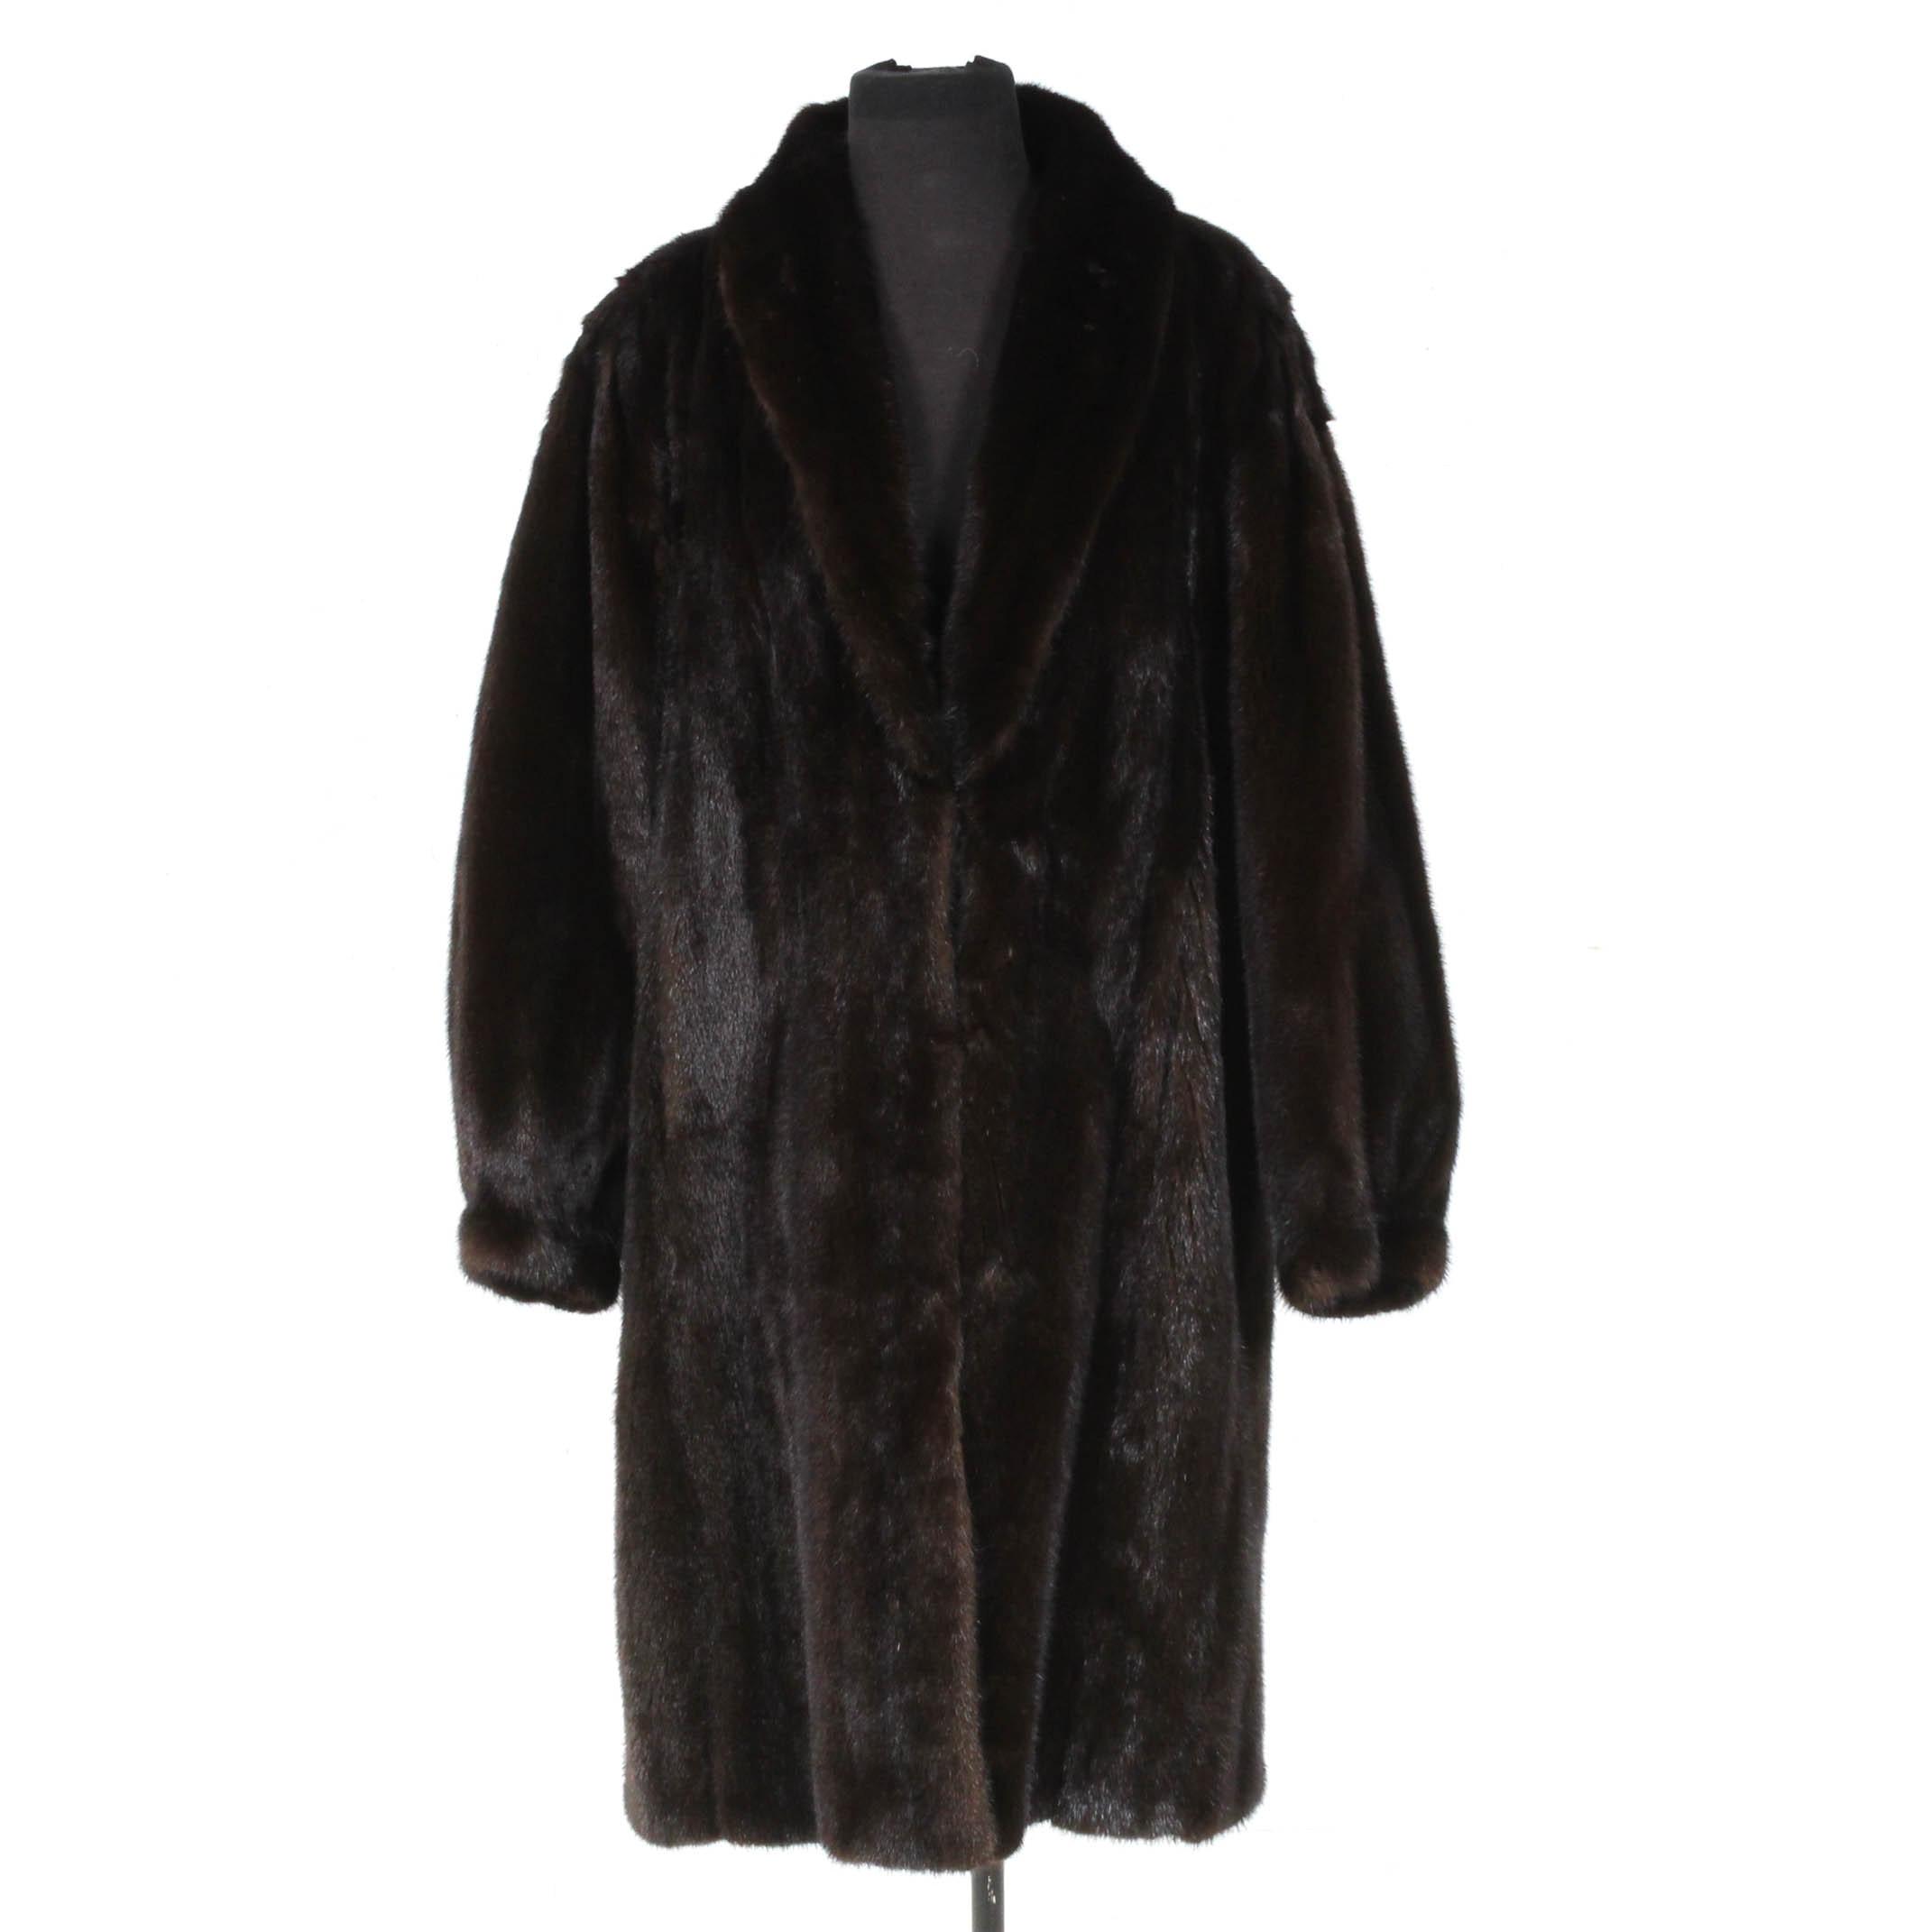 Vintage Dark Mahogany Fur Coat